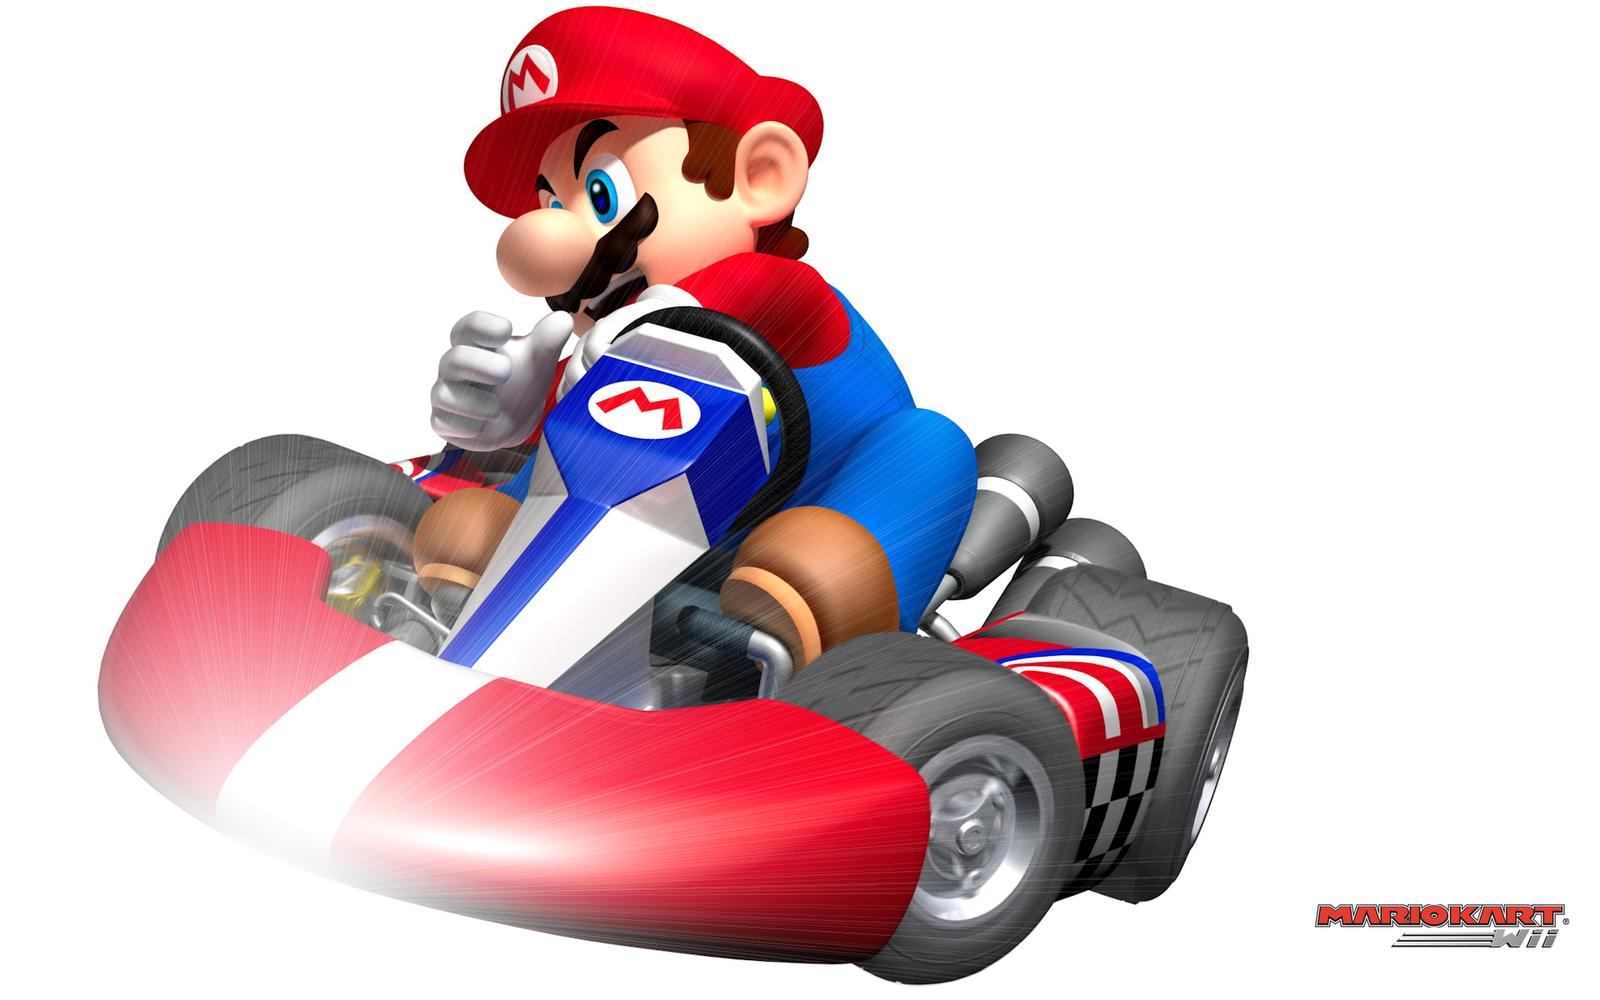 http://2.bp.blogspot.com/-aVTagVNsFEg/TucxZtQDiQI/AAAAAAAAAao/9uSkWhMOwOI/s1600/Mario_Kart_Wii_Wallpaper_by_POOTERMAN.png